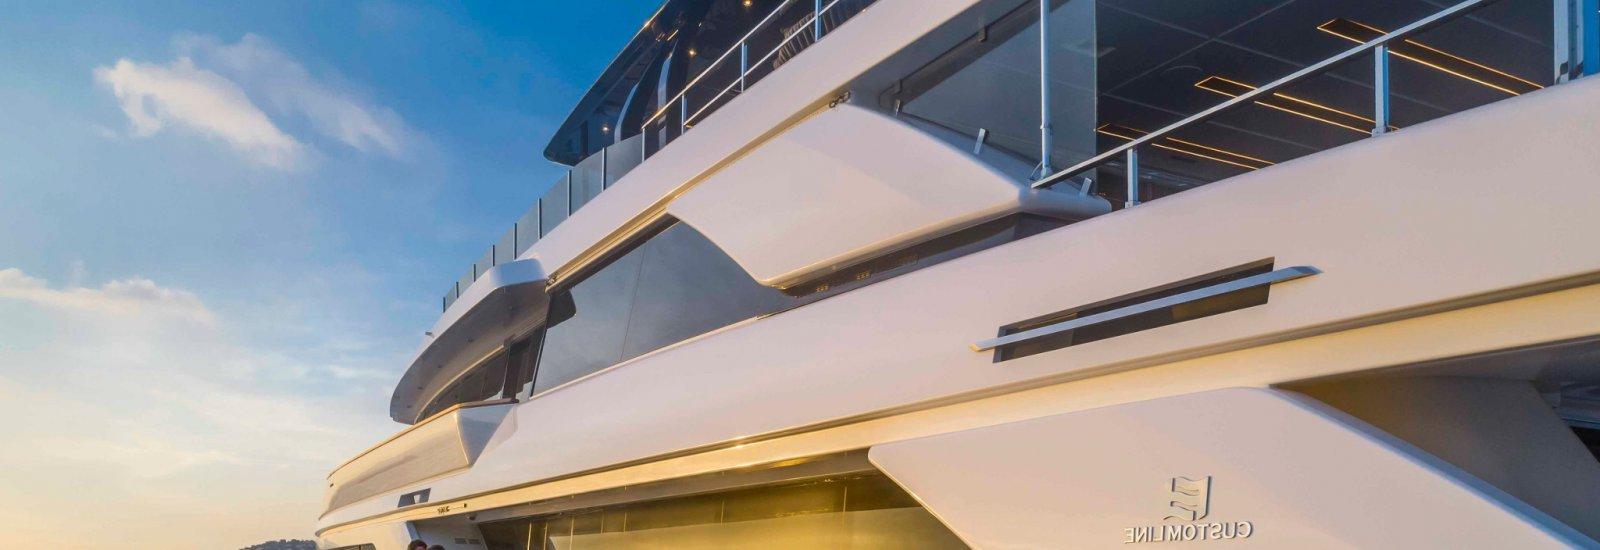 CUSTOM LINE JMA Yachting